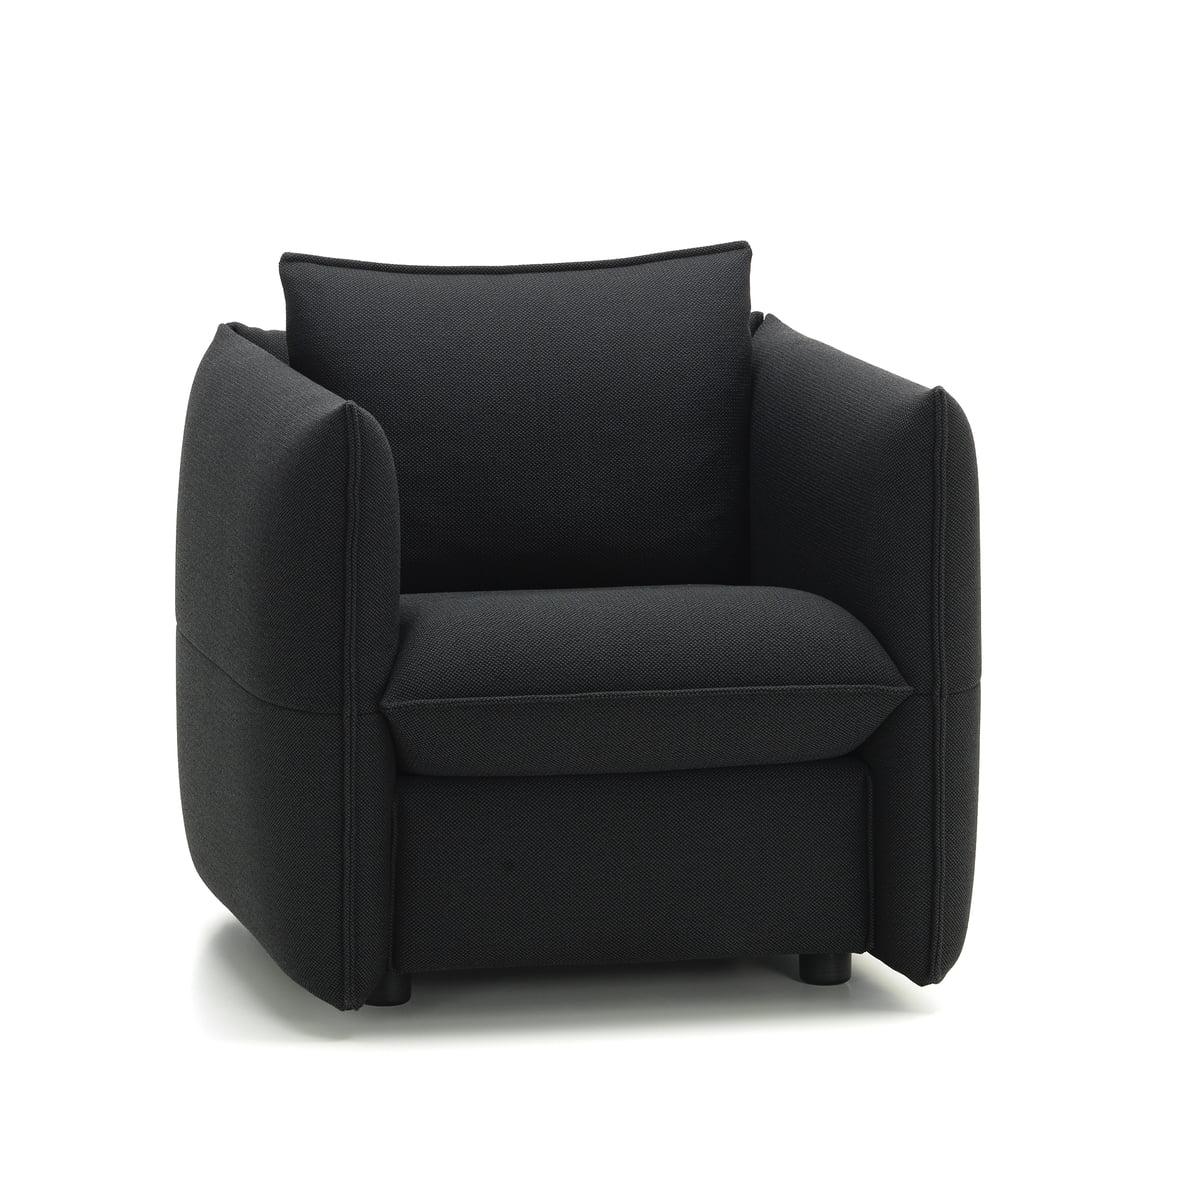 Delicieux Mariposa Club Sofa By Vitra In Plano Dark Grey / Nero (62)